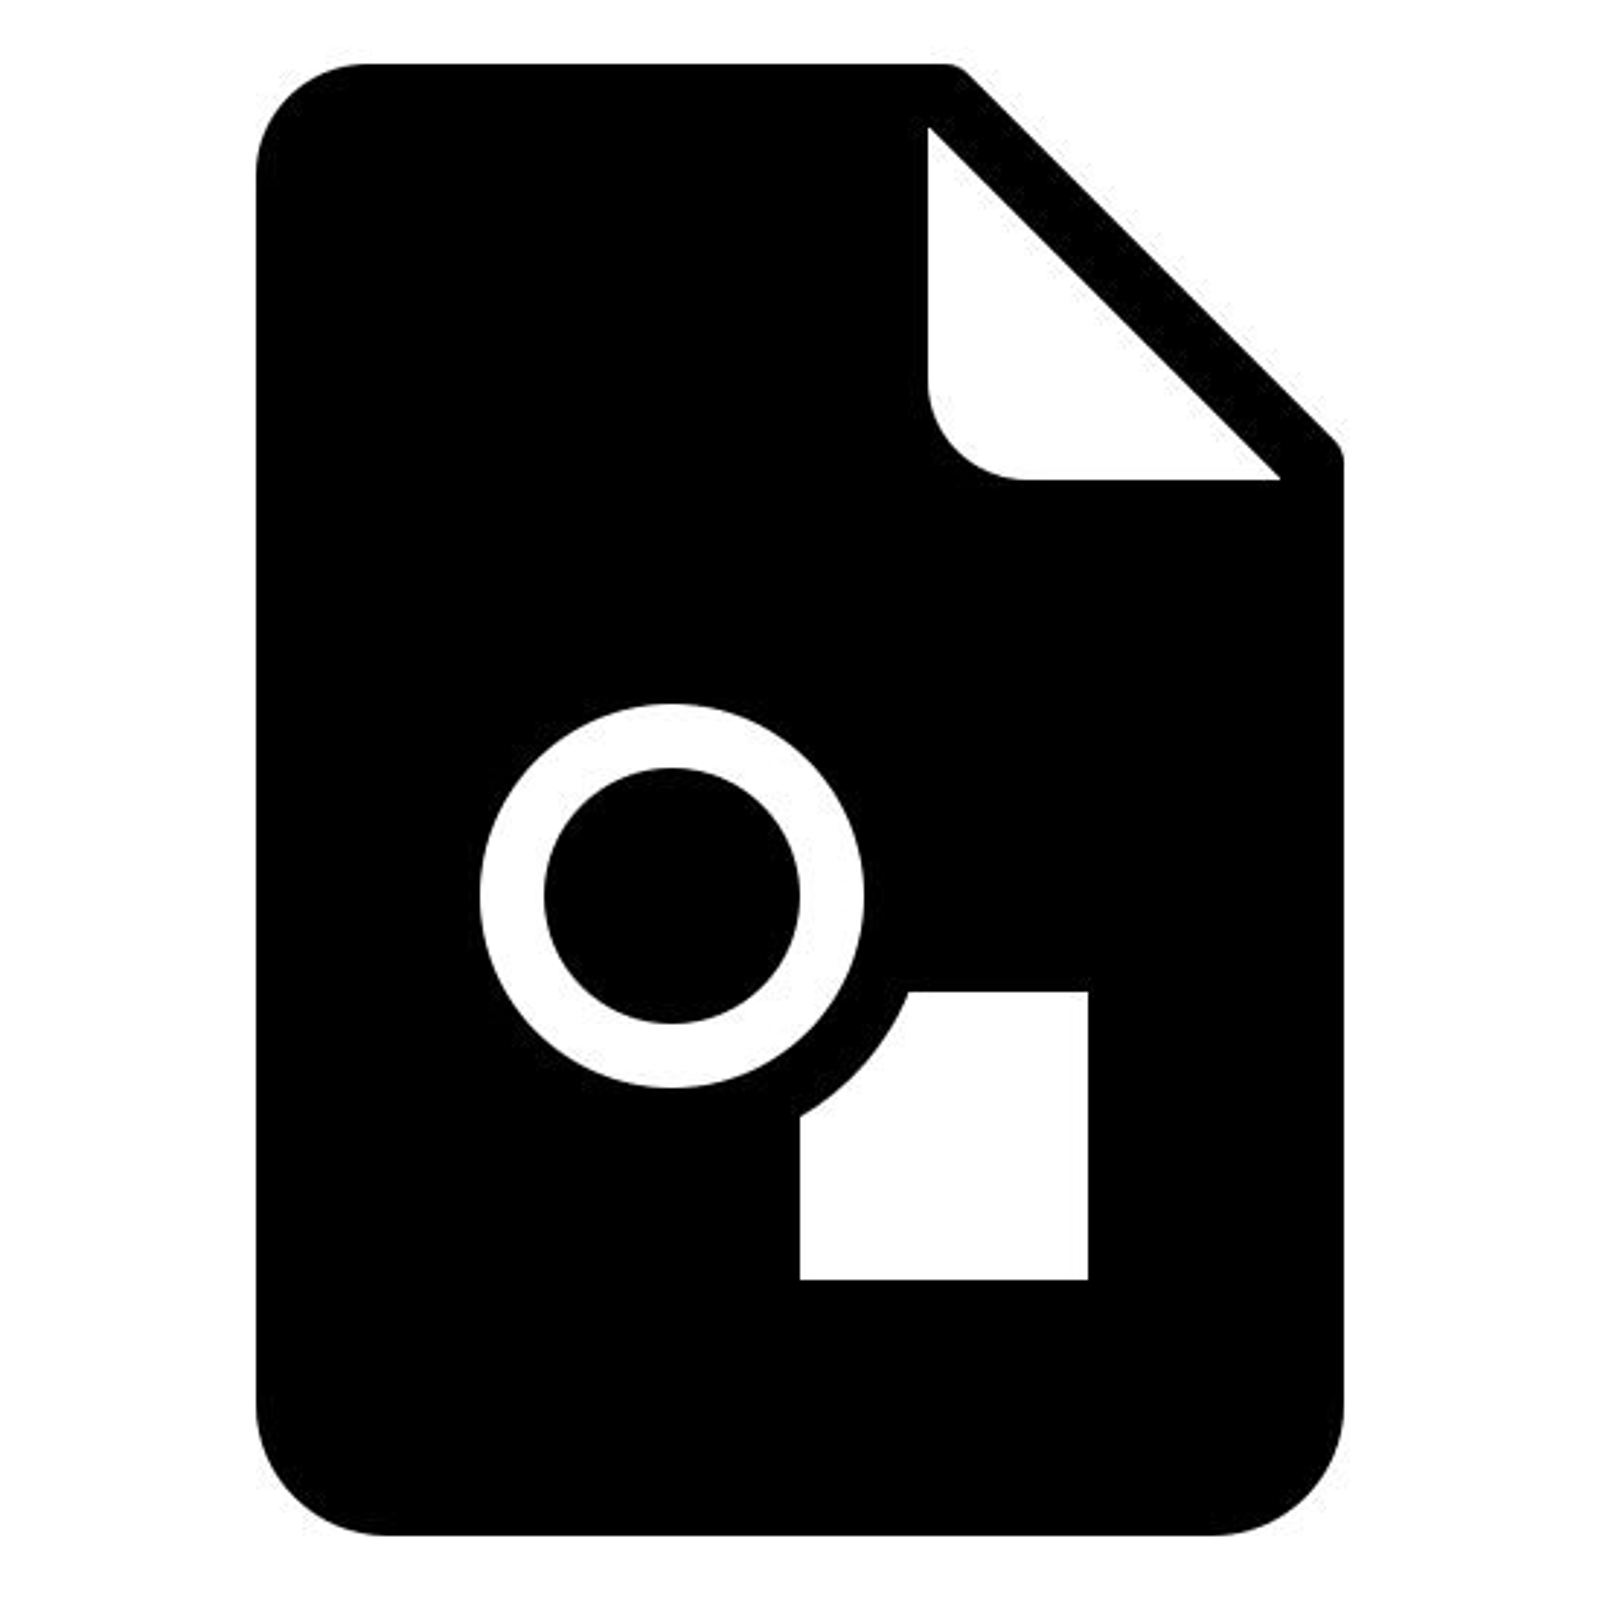 Google 図形描画 icon